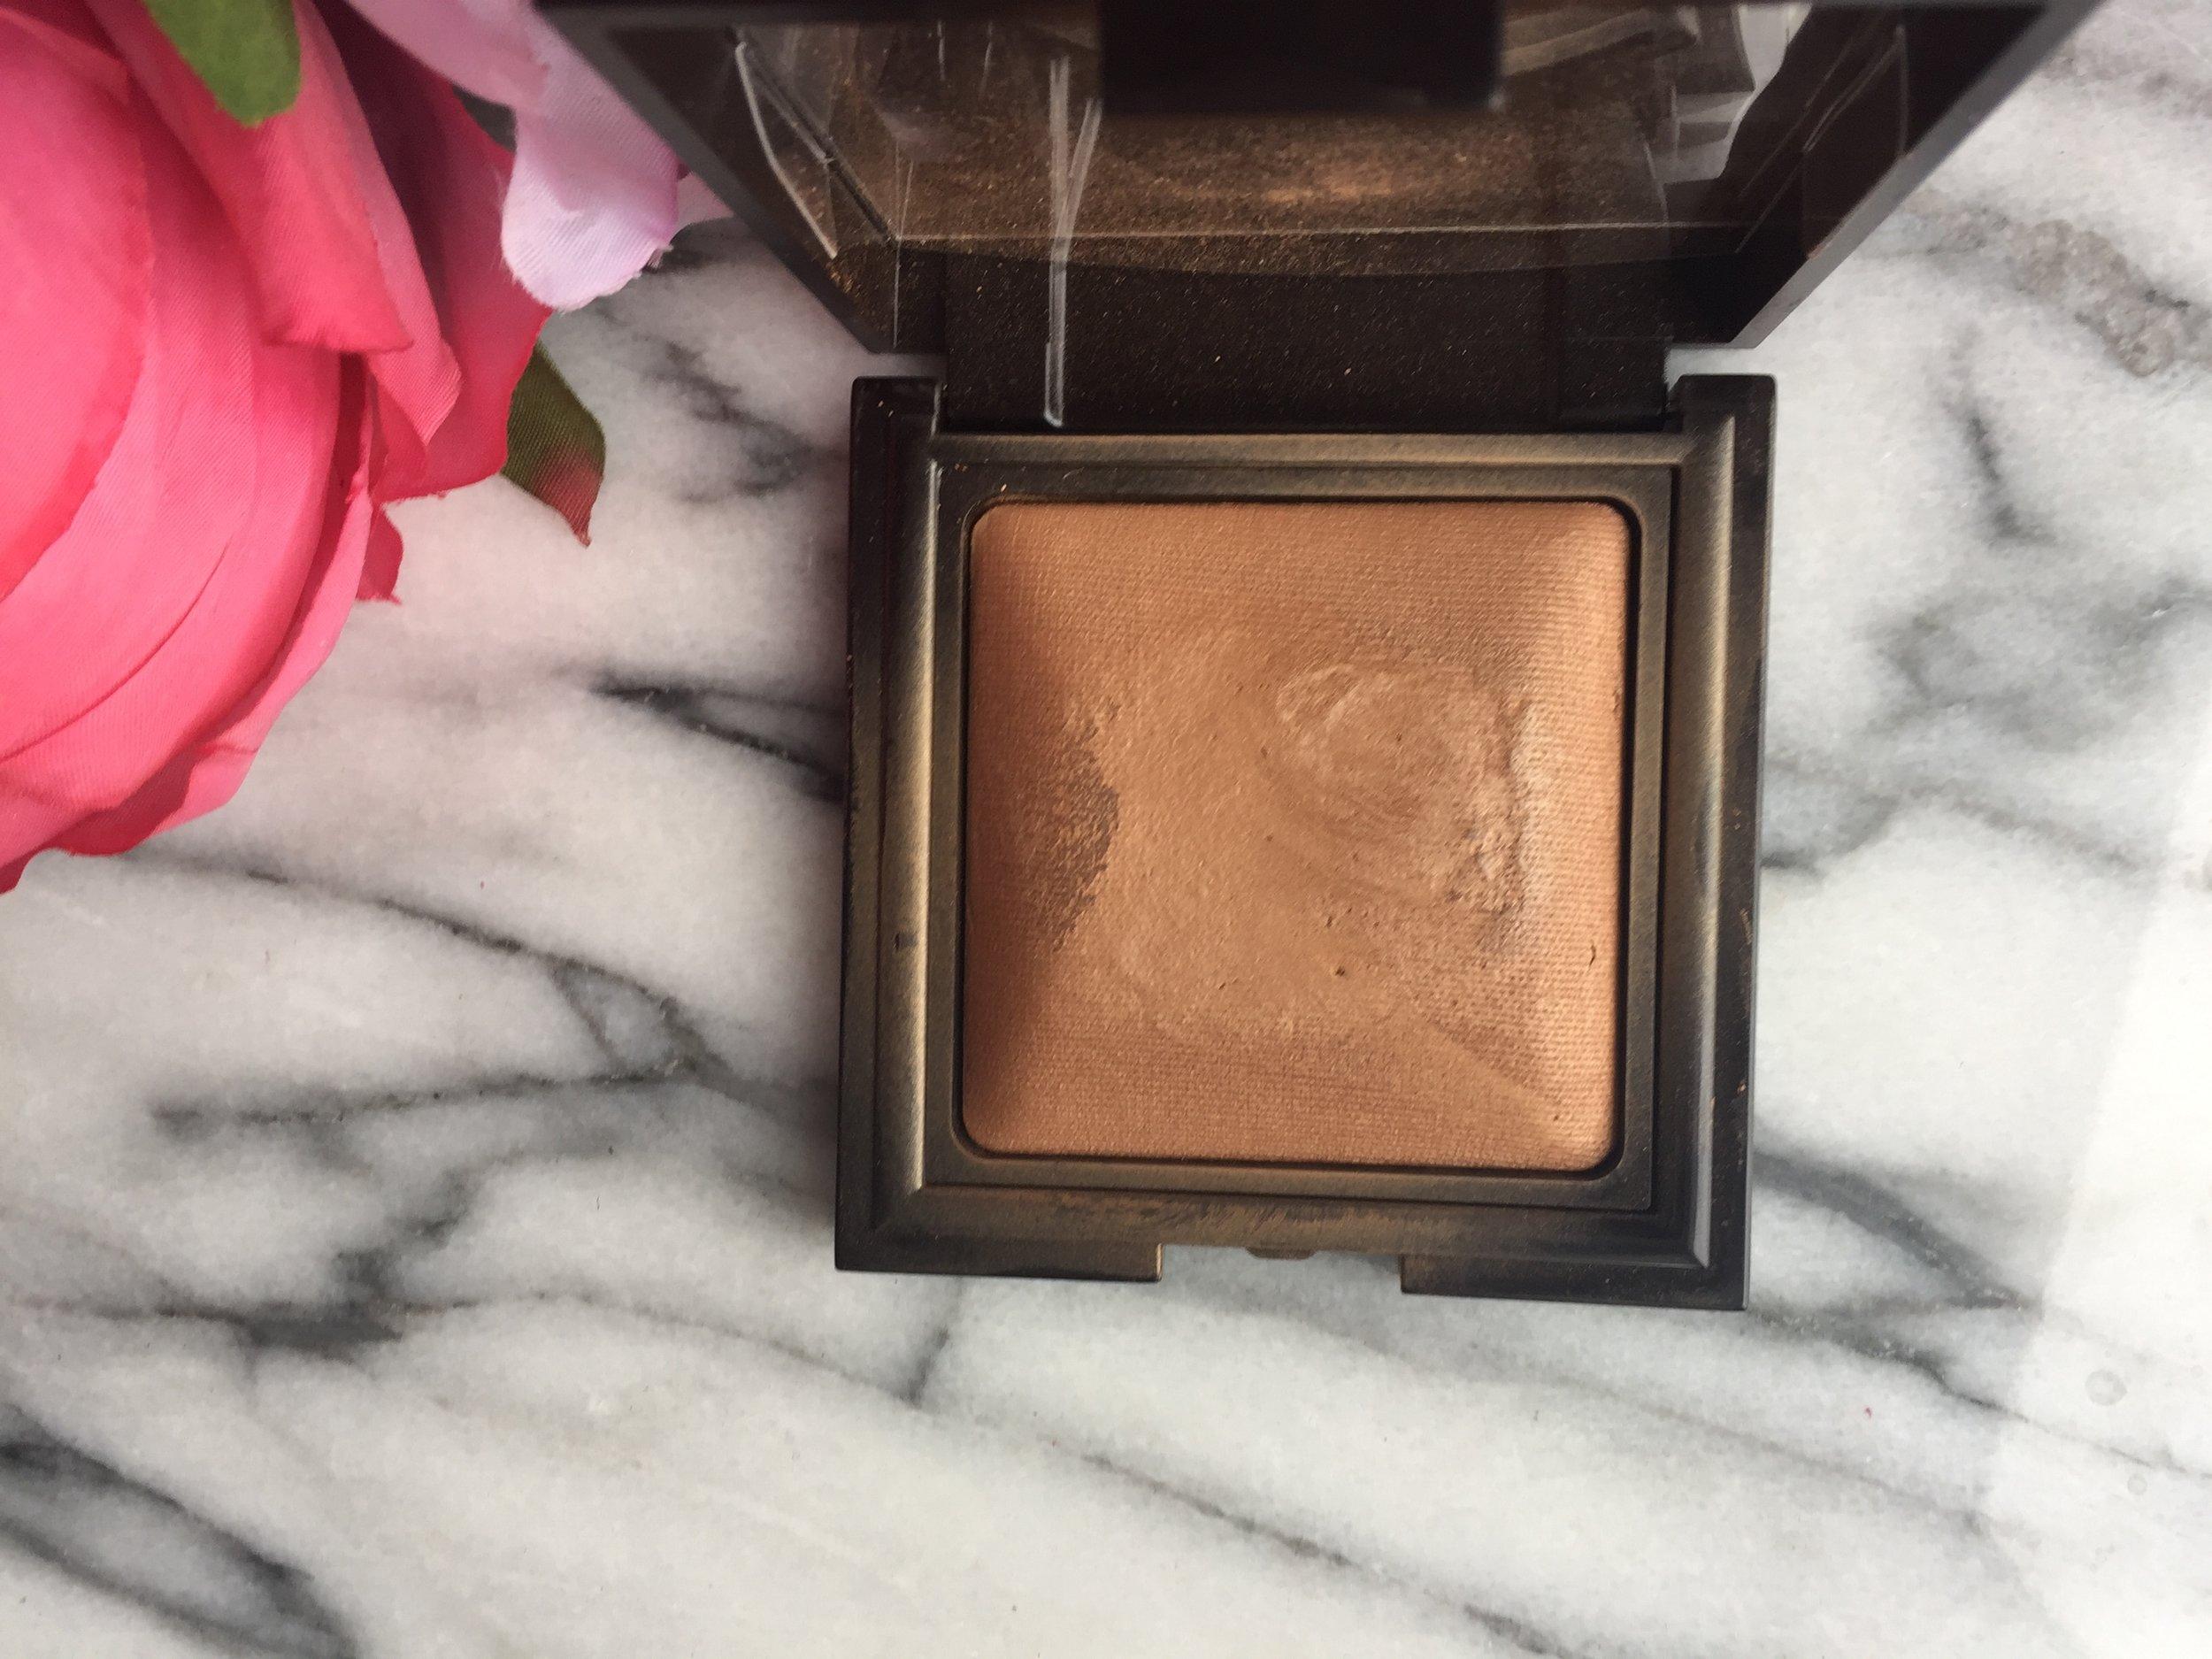 Laura Mercier   Candleglow Sheer Perfecting Powder in Medium Deep